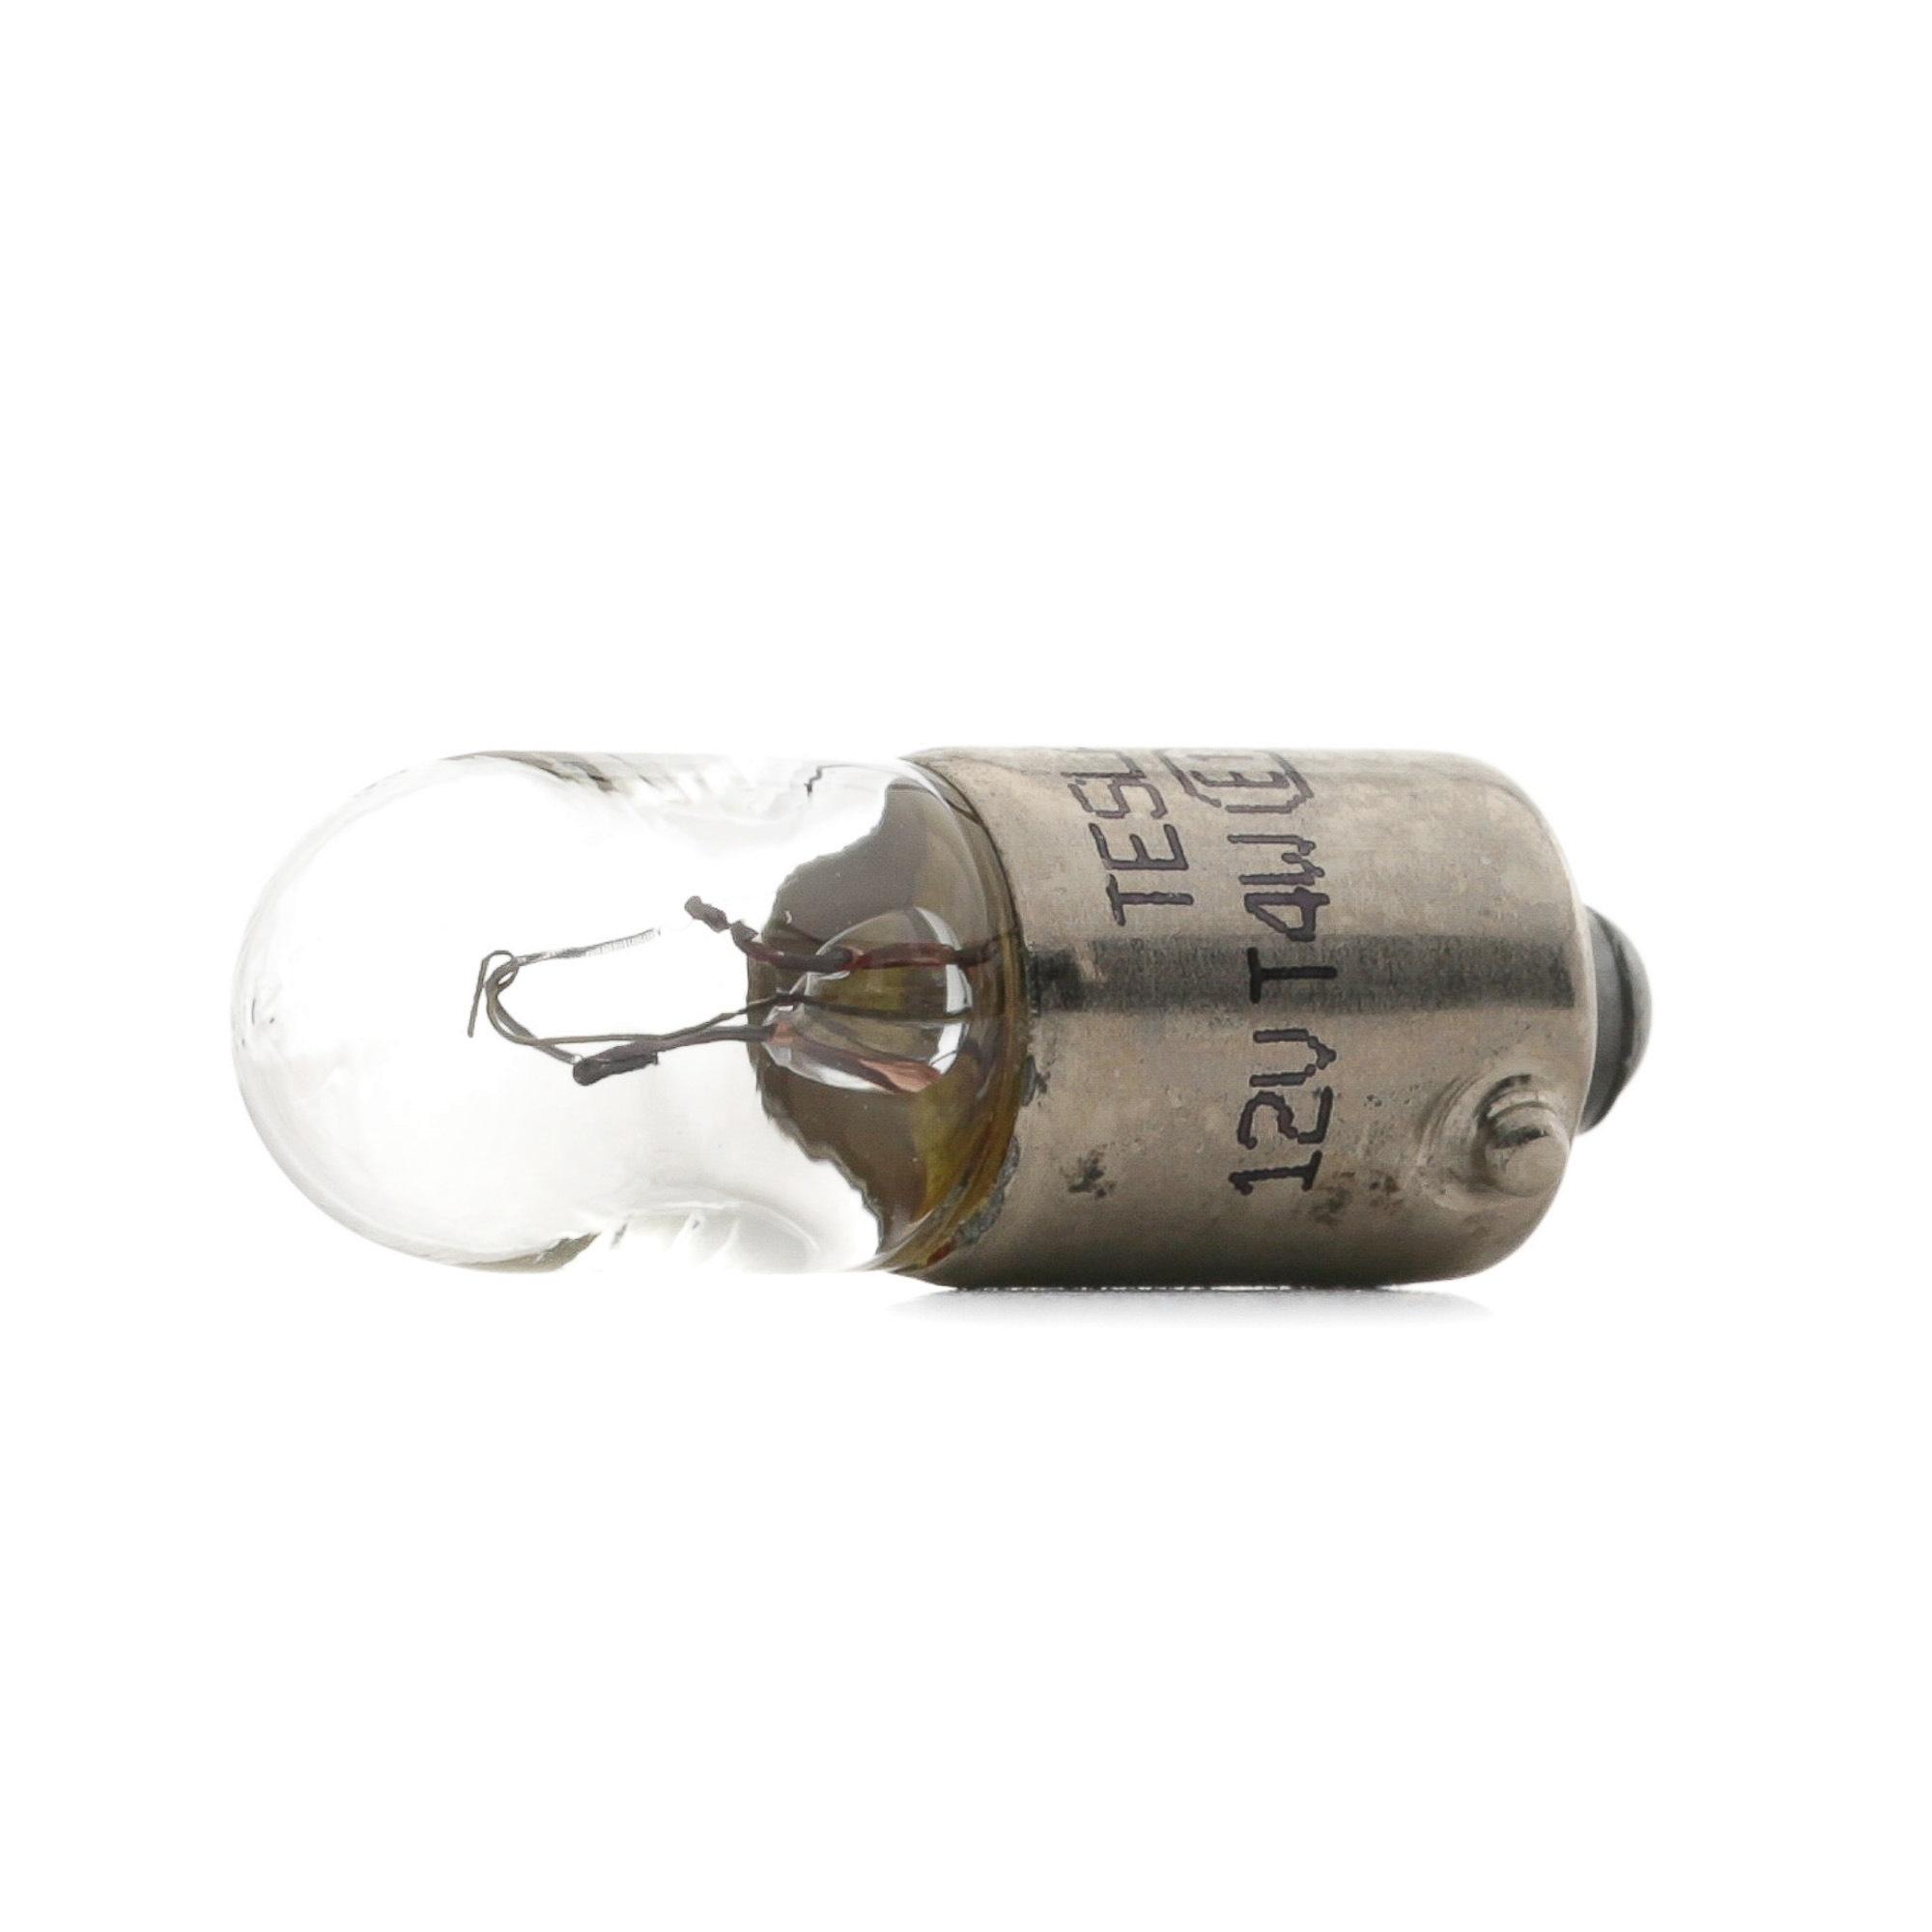 Glühlampe, Blinkleuchte TESLA B54101 Bewertung